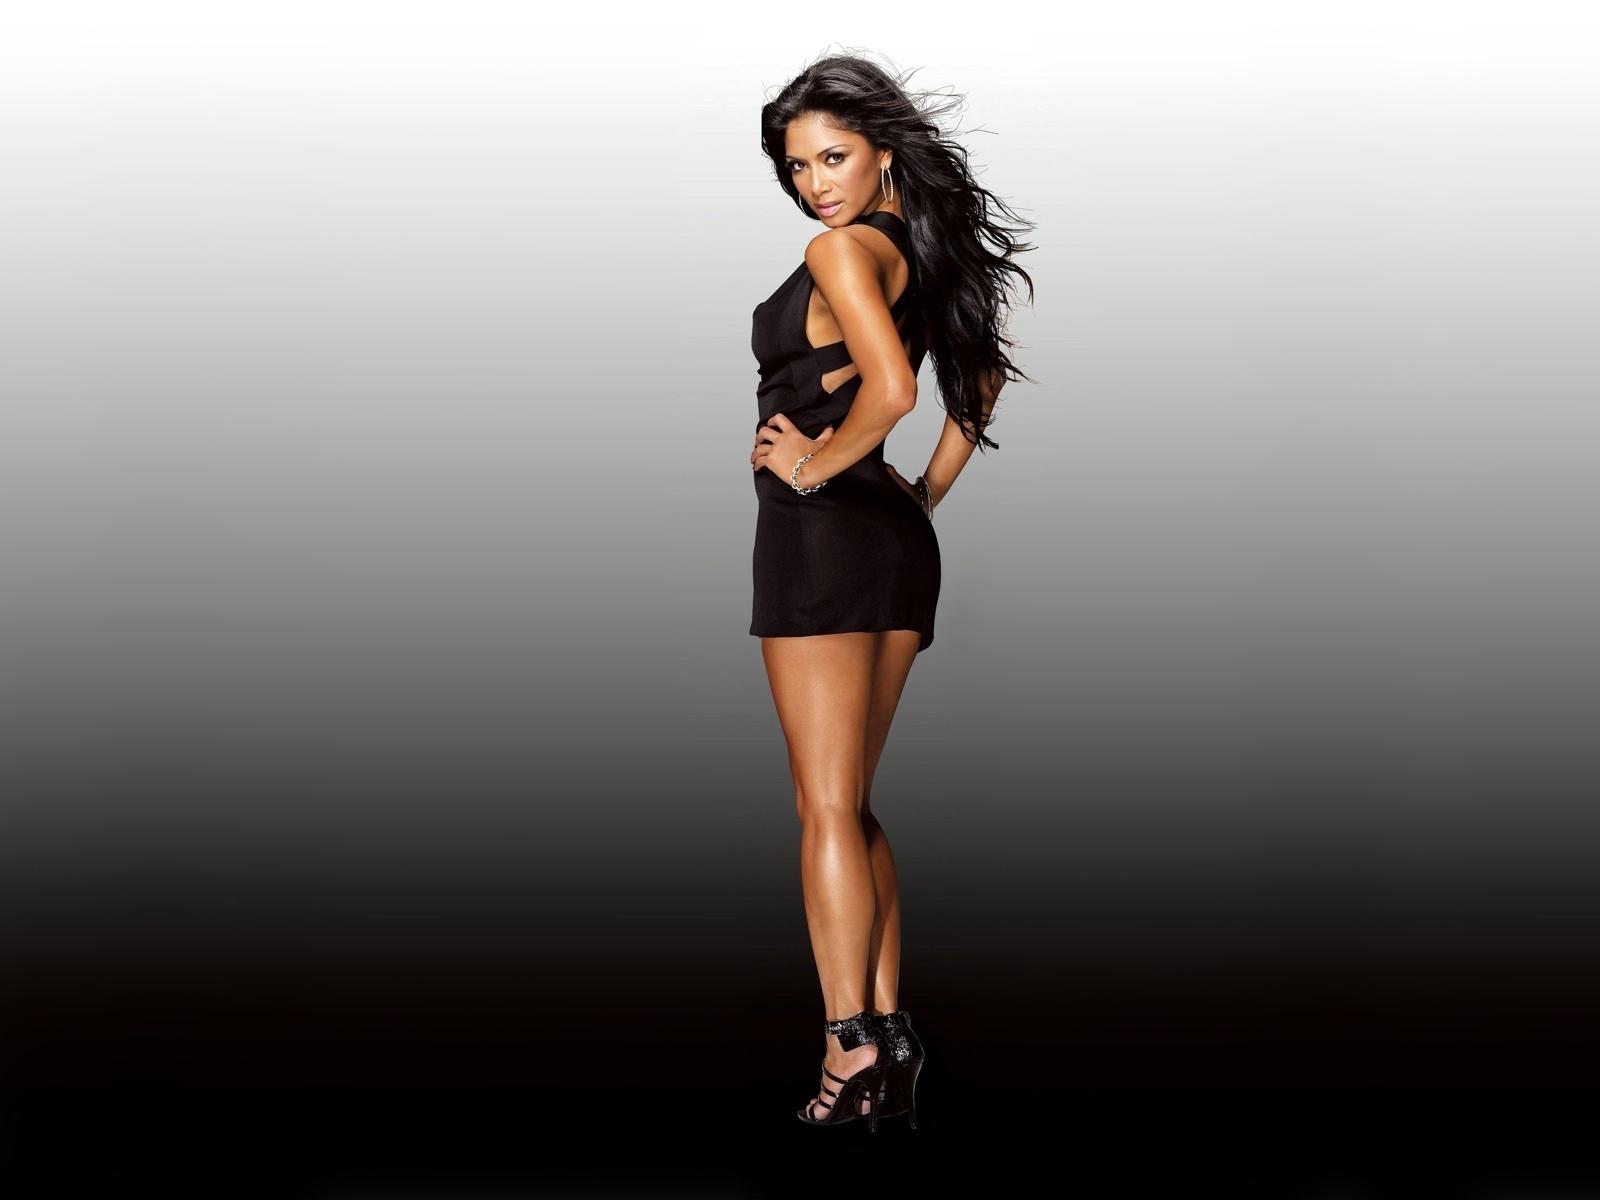 Nicole nice legs   Nicole Scherzinger Wallpaper 22039846 1600x1200